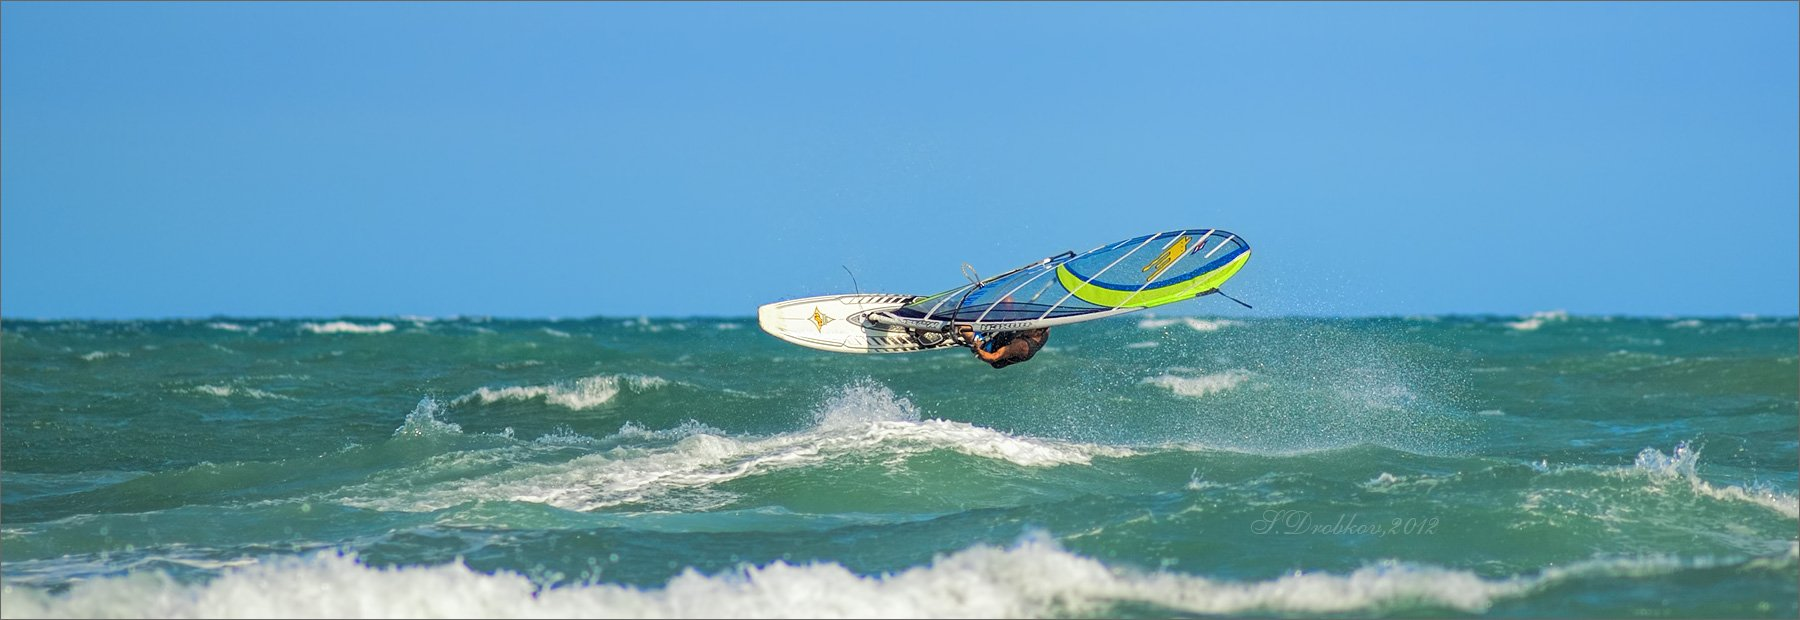 сёрфинг, спорт, досуг, море, Sergey Drobkov